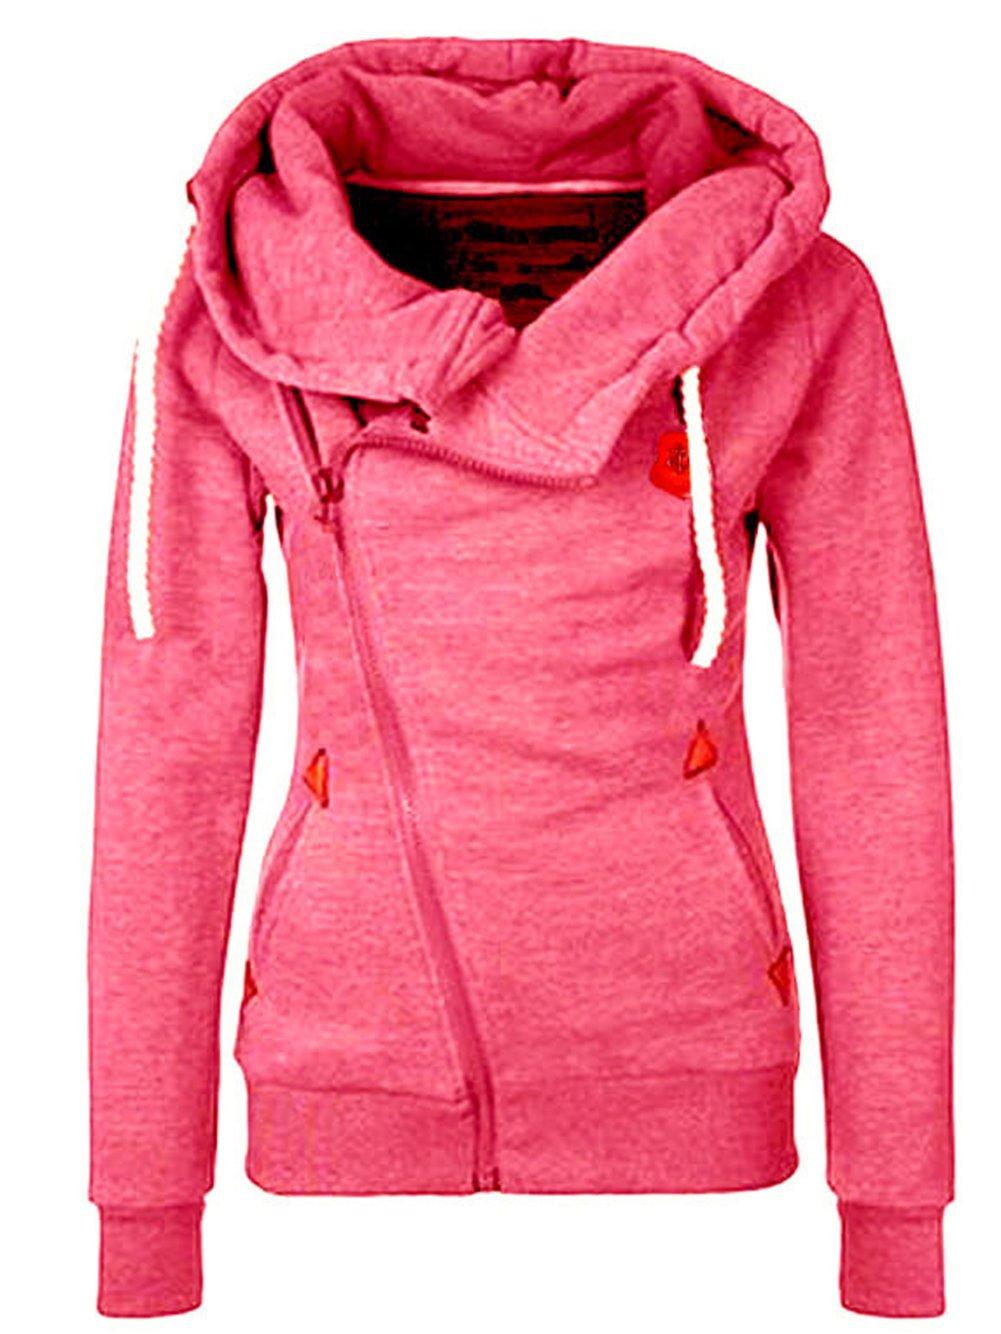 FANTIGO Women's Oblique Zipper Hoodie Sweatshirt Slim Fit Coat CFTG220002